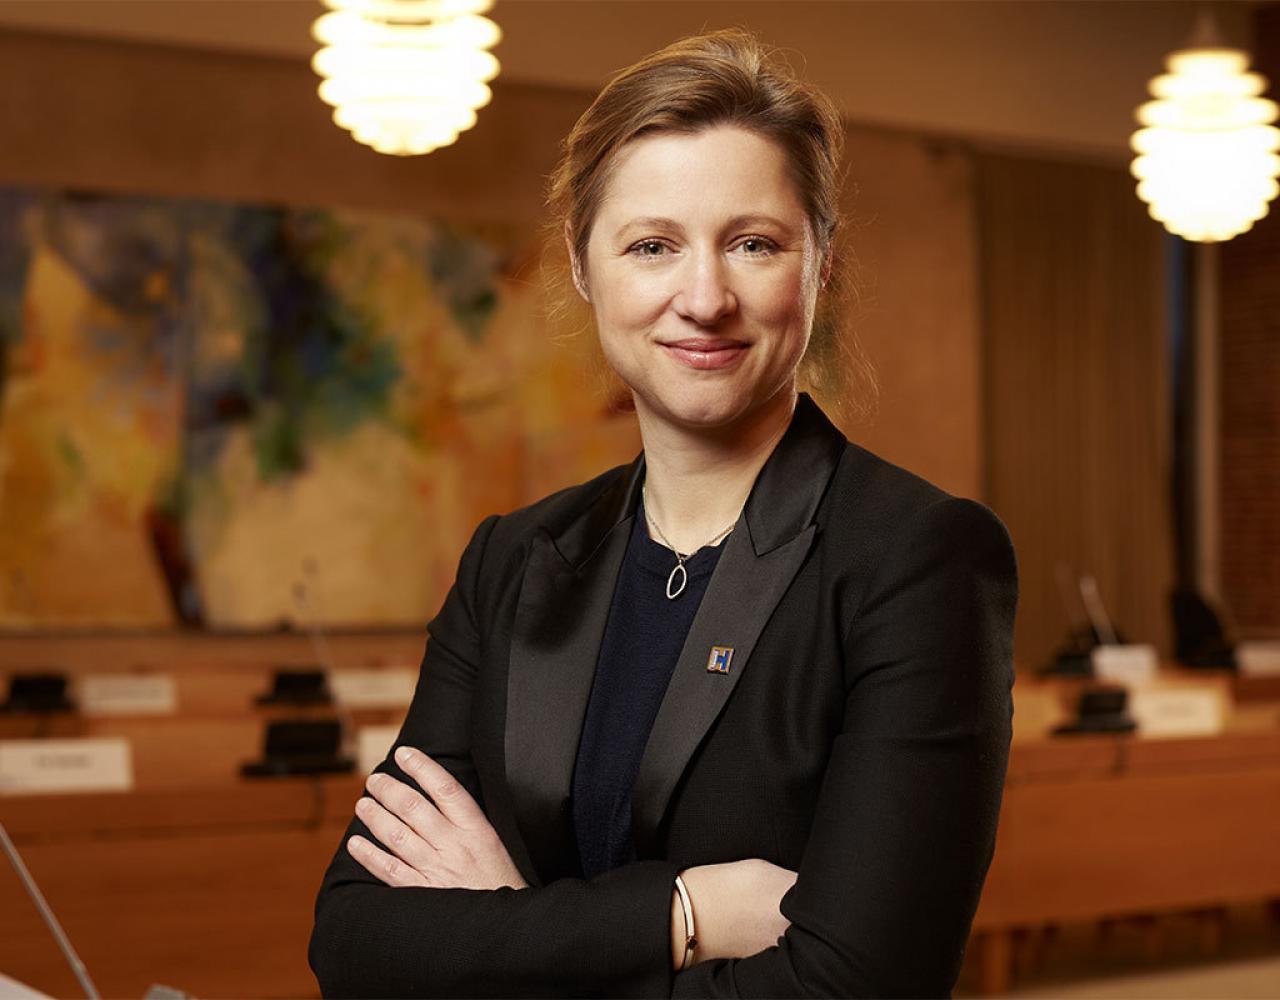 Sophie Hæstorp Andersen, borgmester, rådhus, socialdemokrat